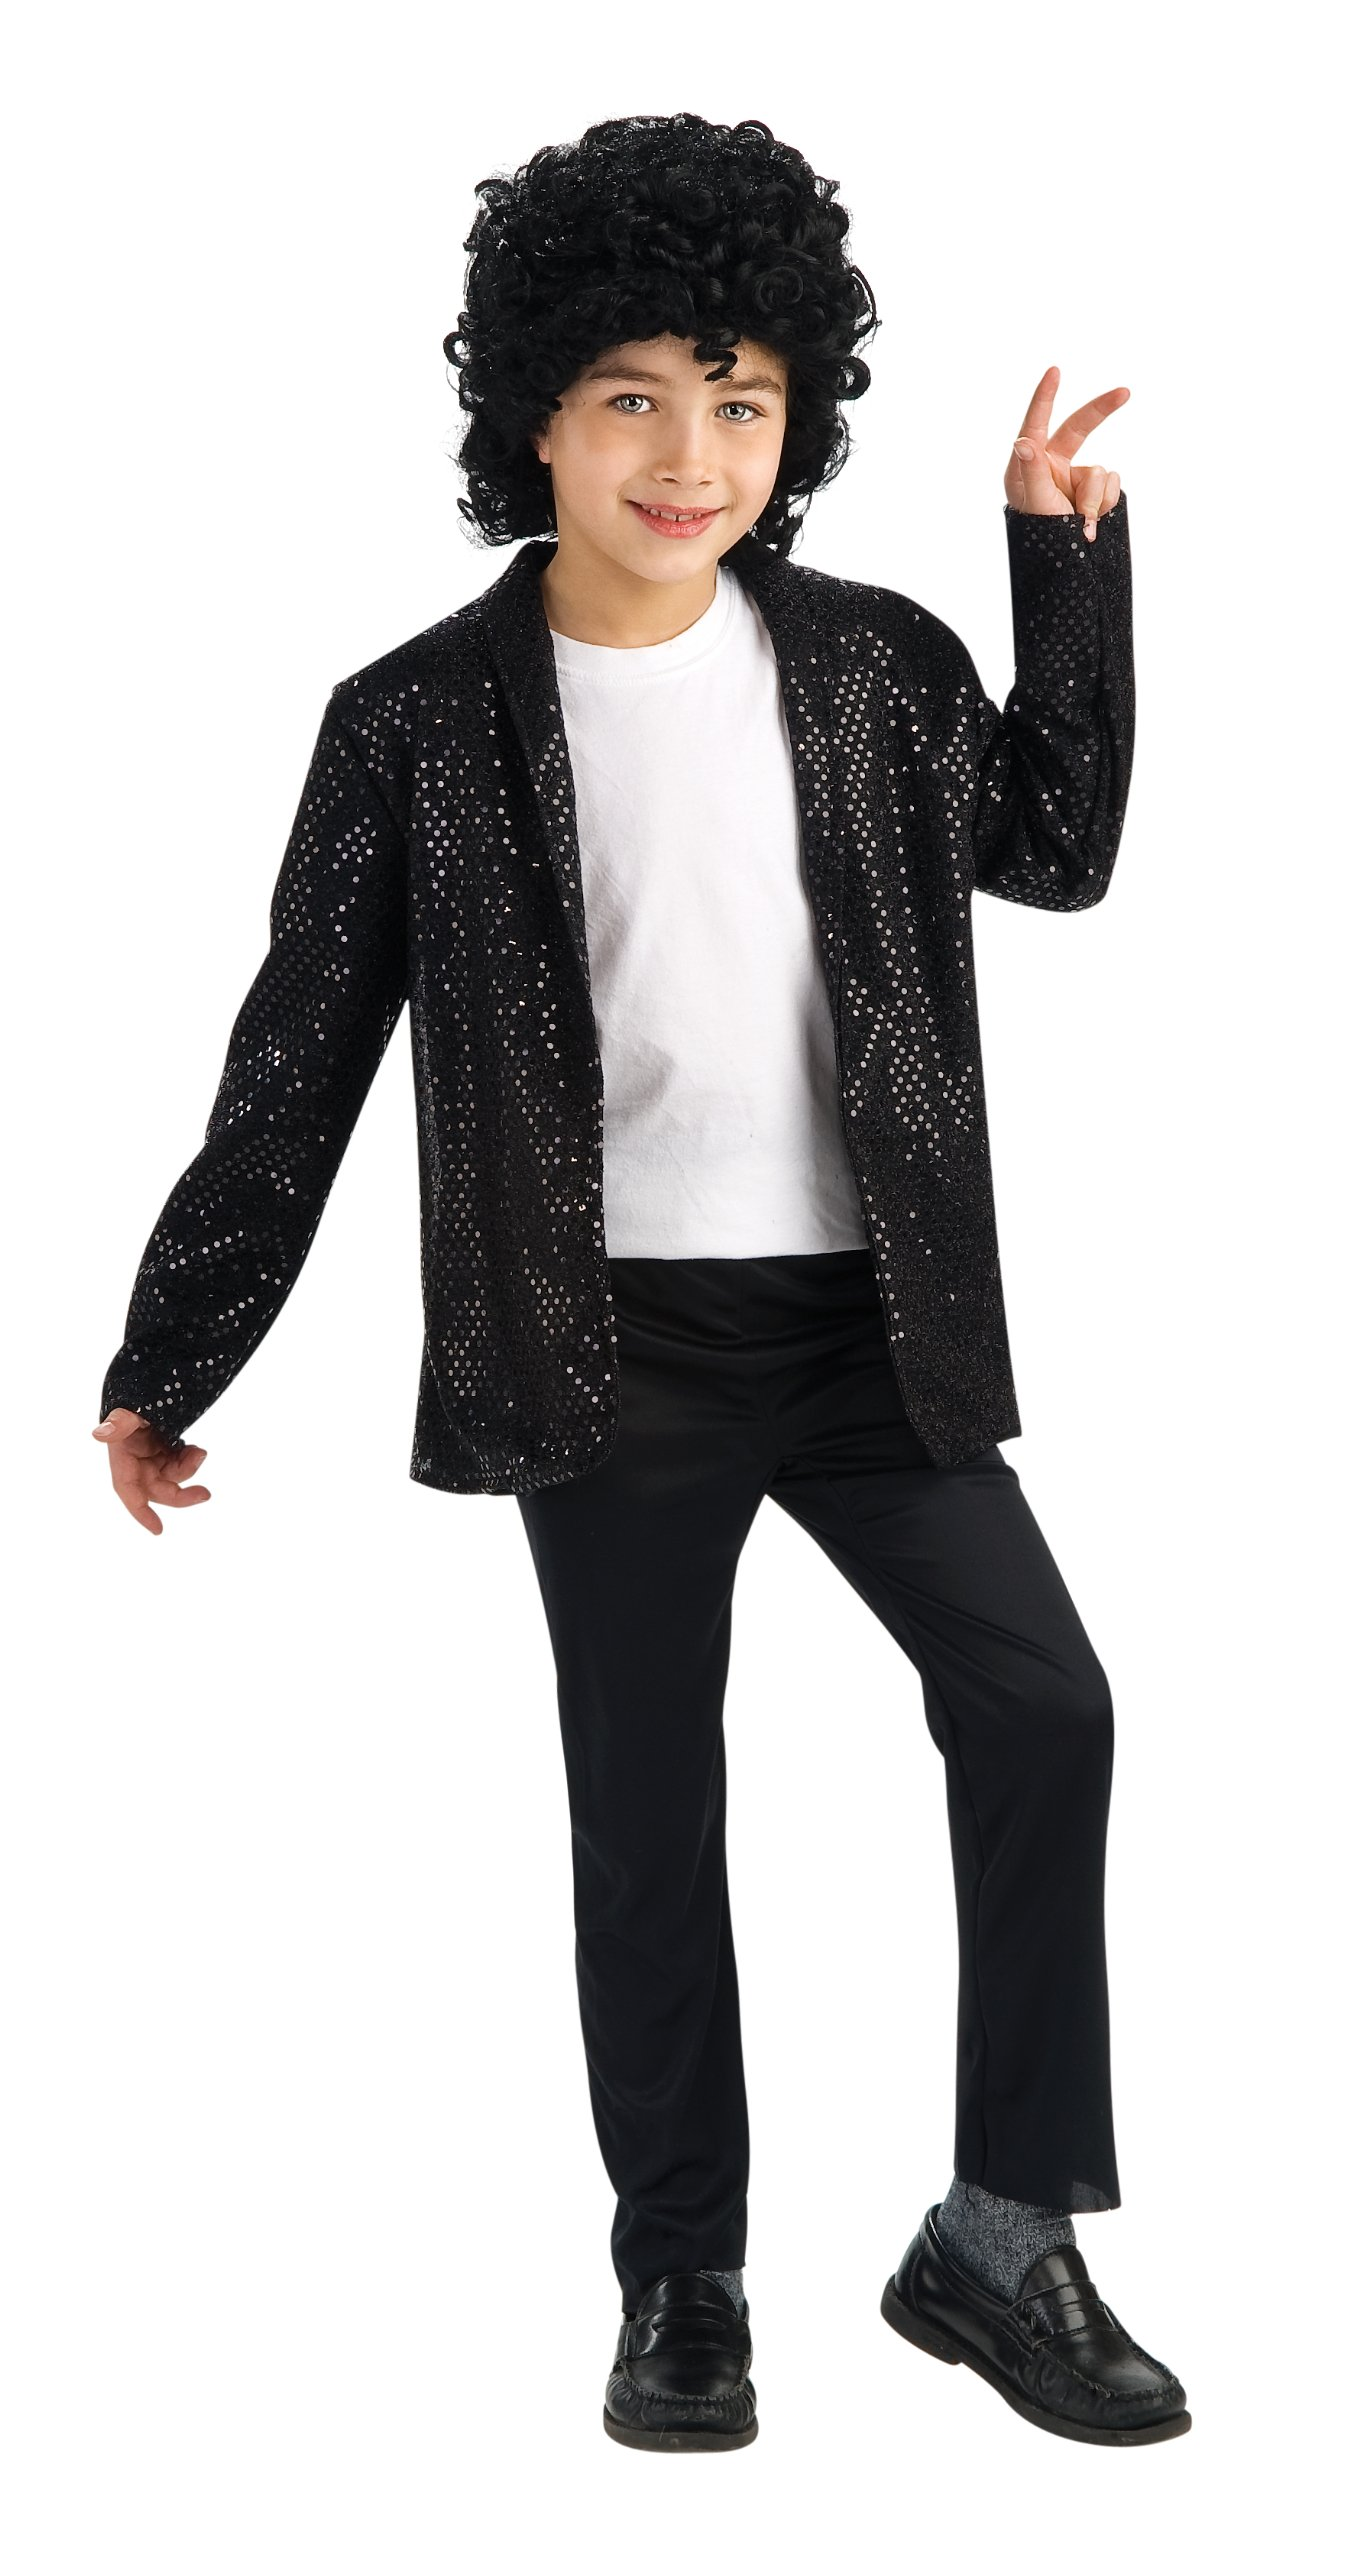 Michael Jackson Child's Deluxe Billie Jean Sequin Jacket Costume Accessory, Small